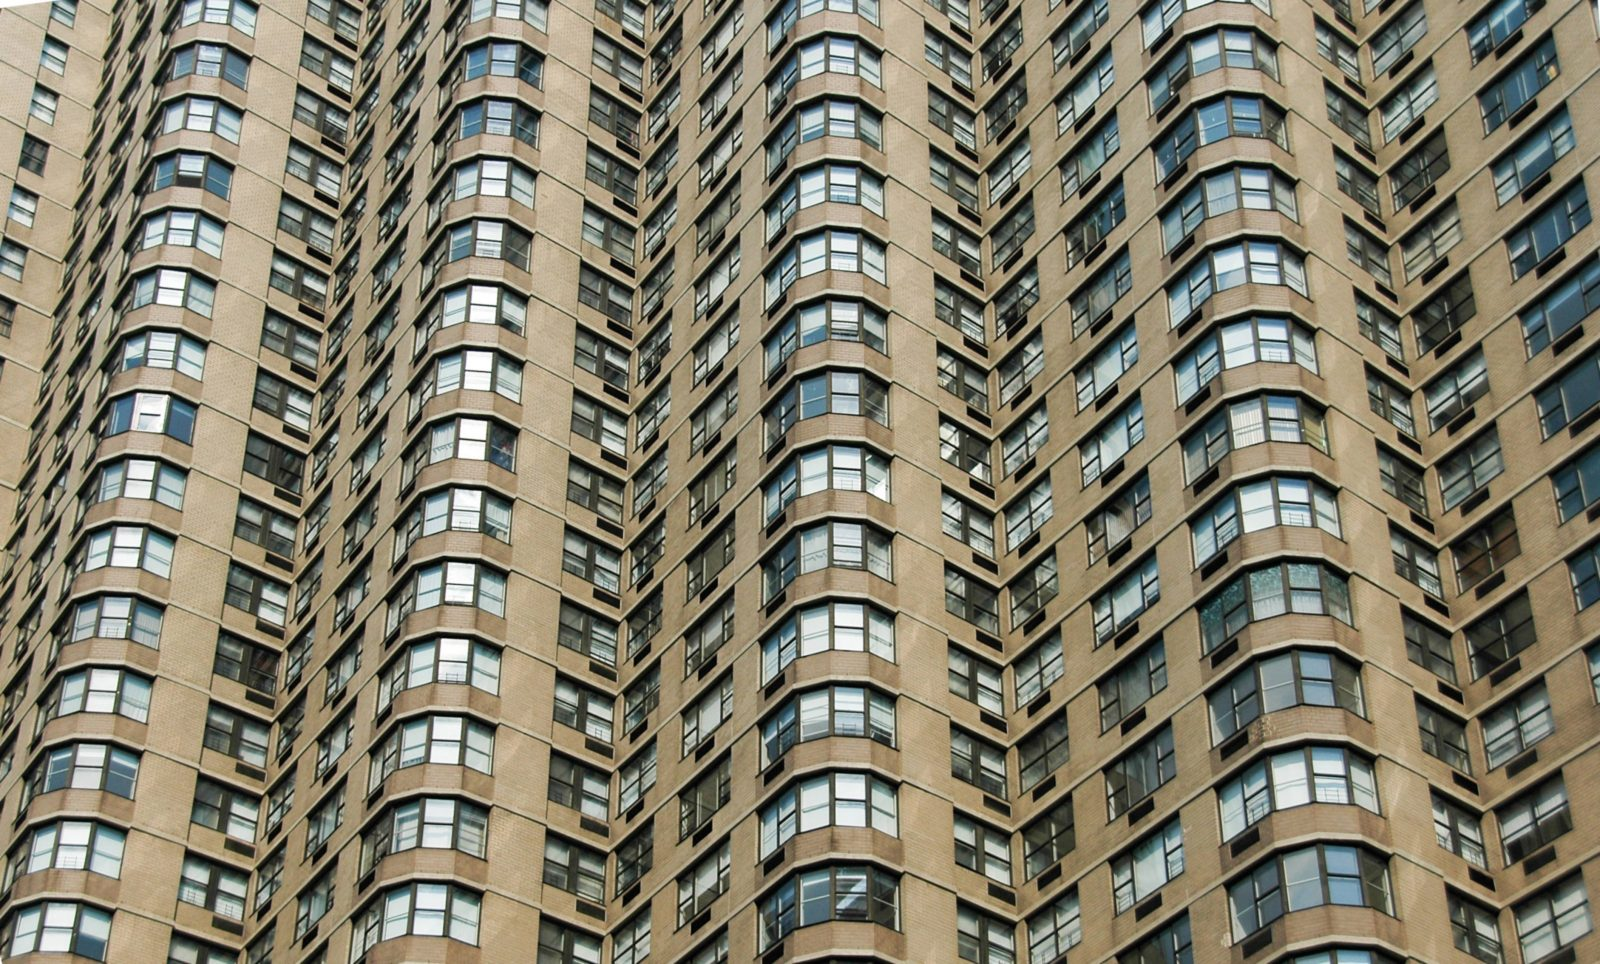 New York condos pattern